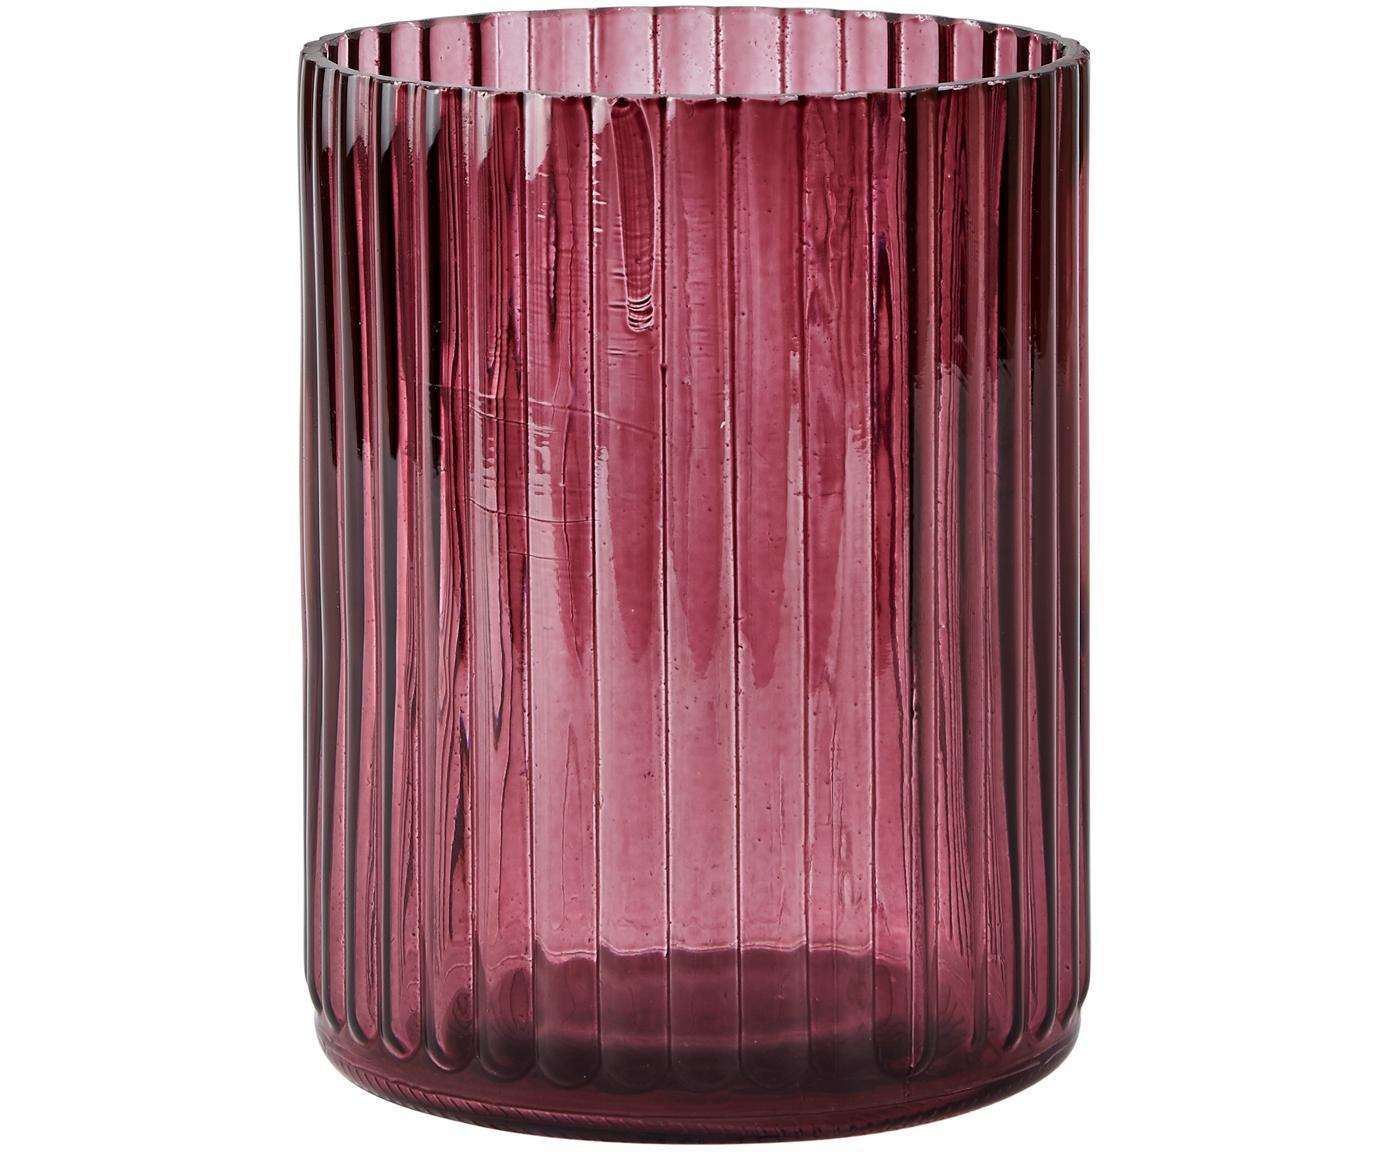 Kleine glazen vaas Rubio, Glas, Bordeauxrood, transparent, Ø 11 x H 15 cm